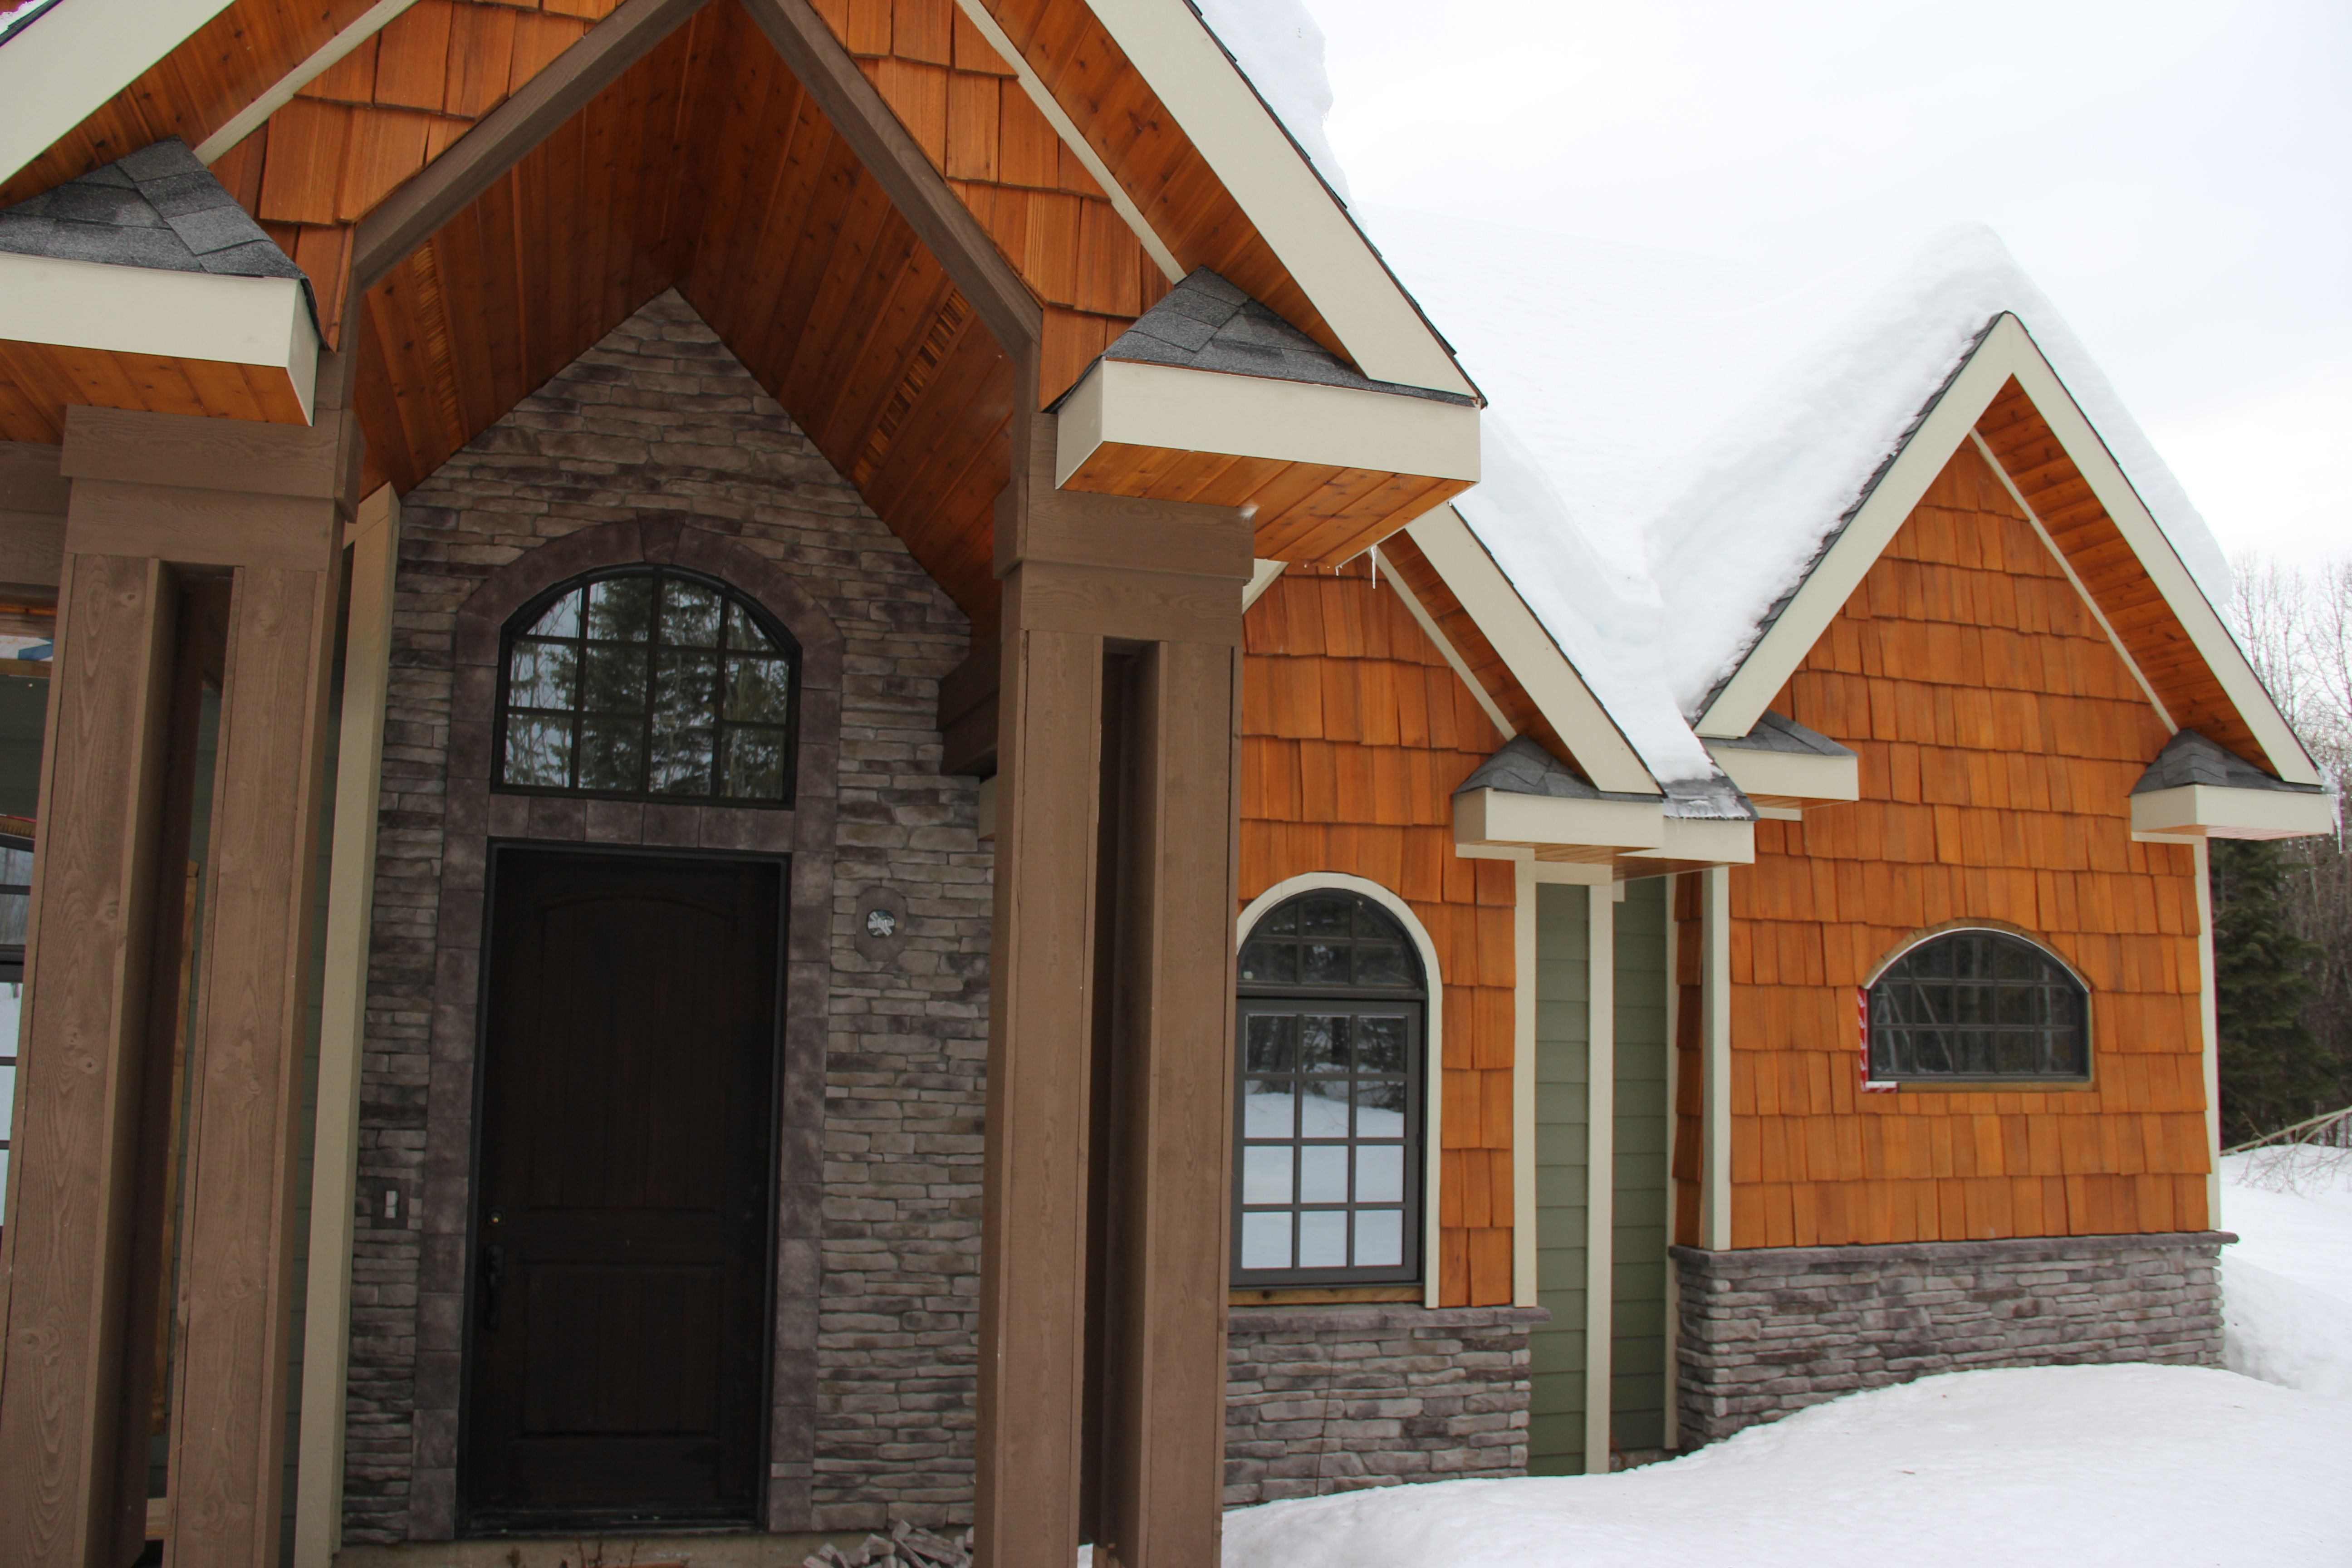 A Cozy Winter Wonderland Including Our Black Bear Stone Veneer